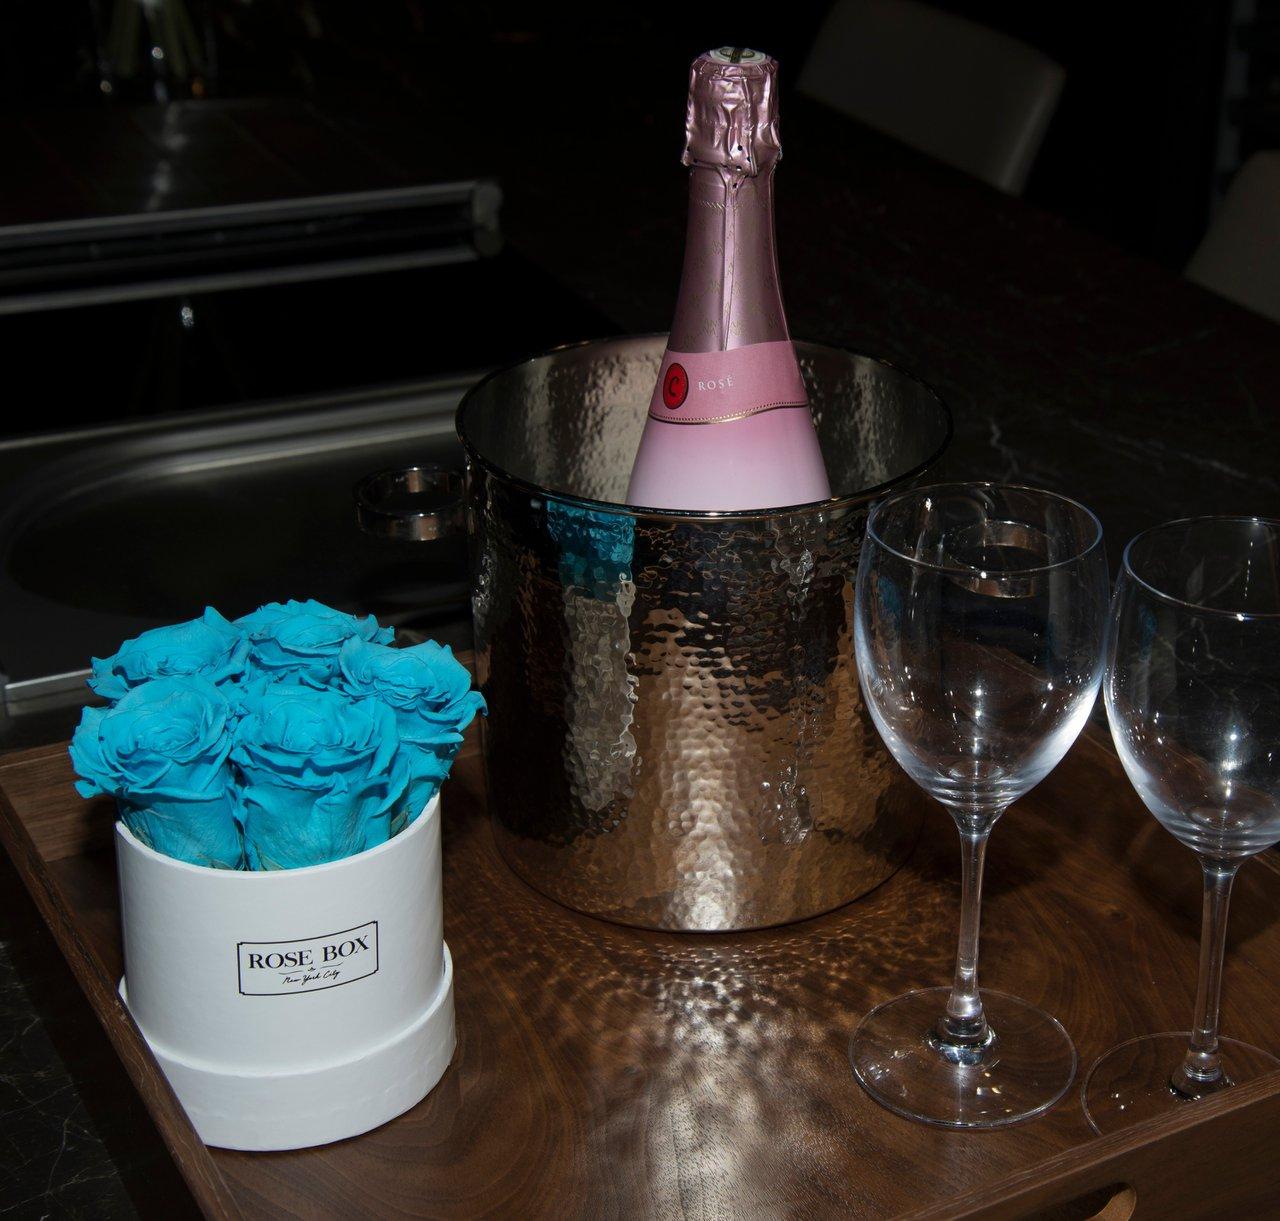 Rose Box House photo DSC_0129.jpg